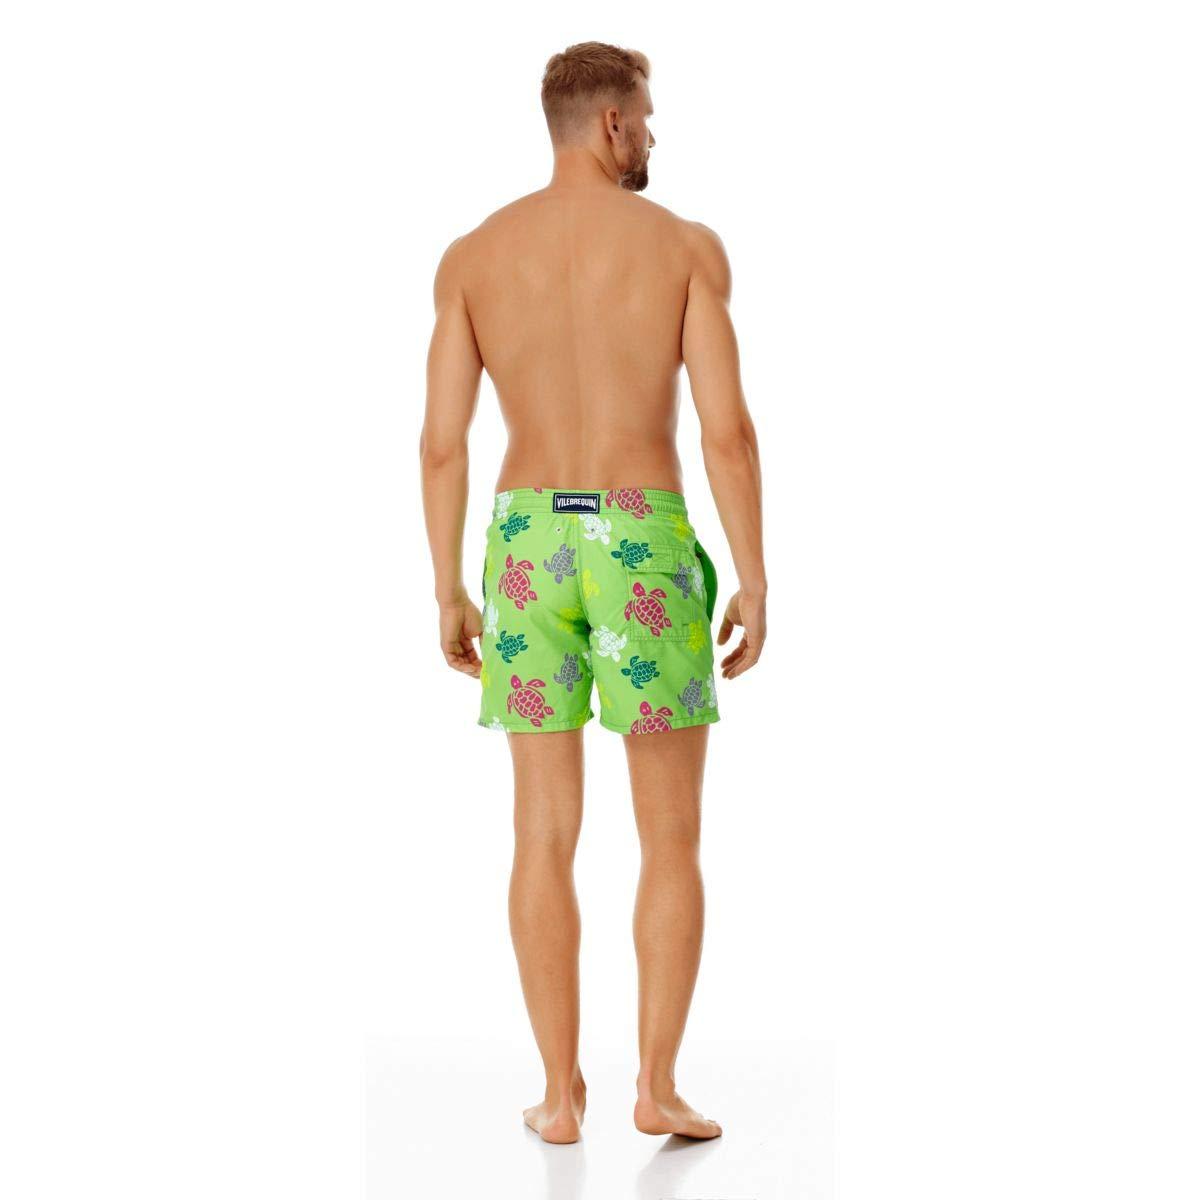 572e4b161a Vilebrequin Men's Swim Trunks: Amazon.co.uk: Clothing